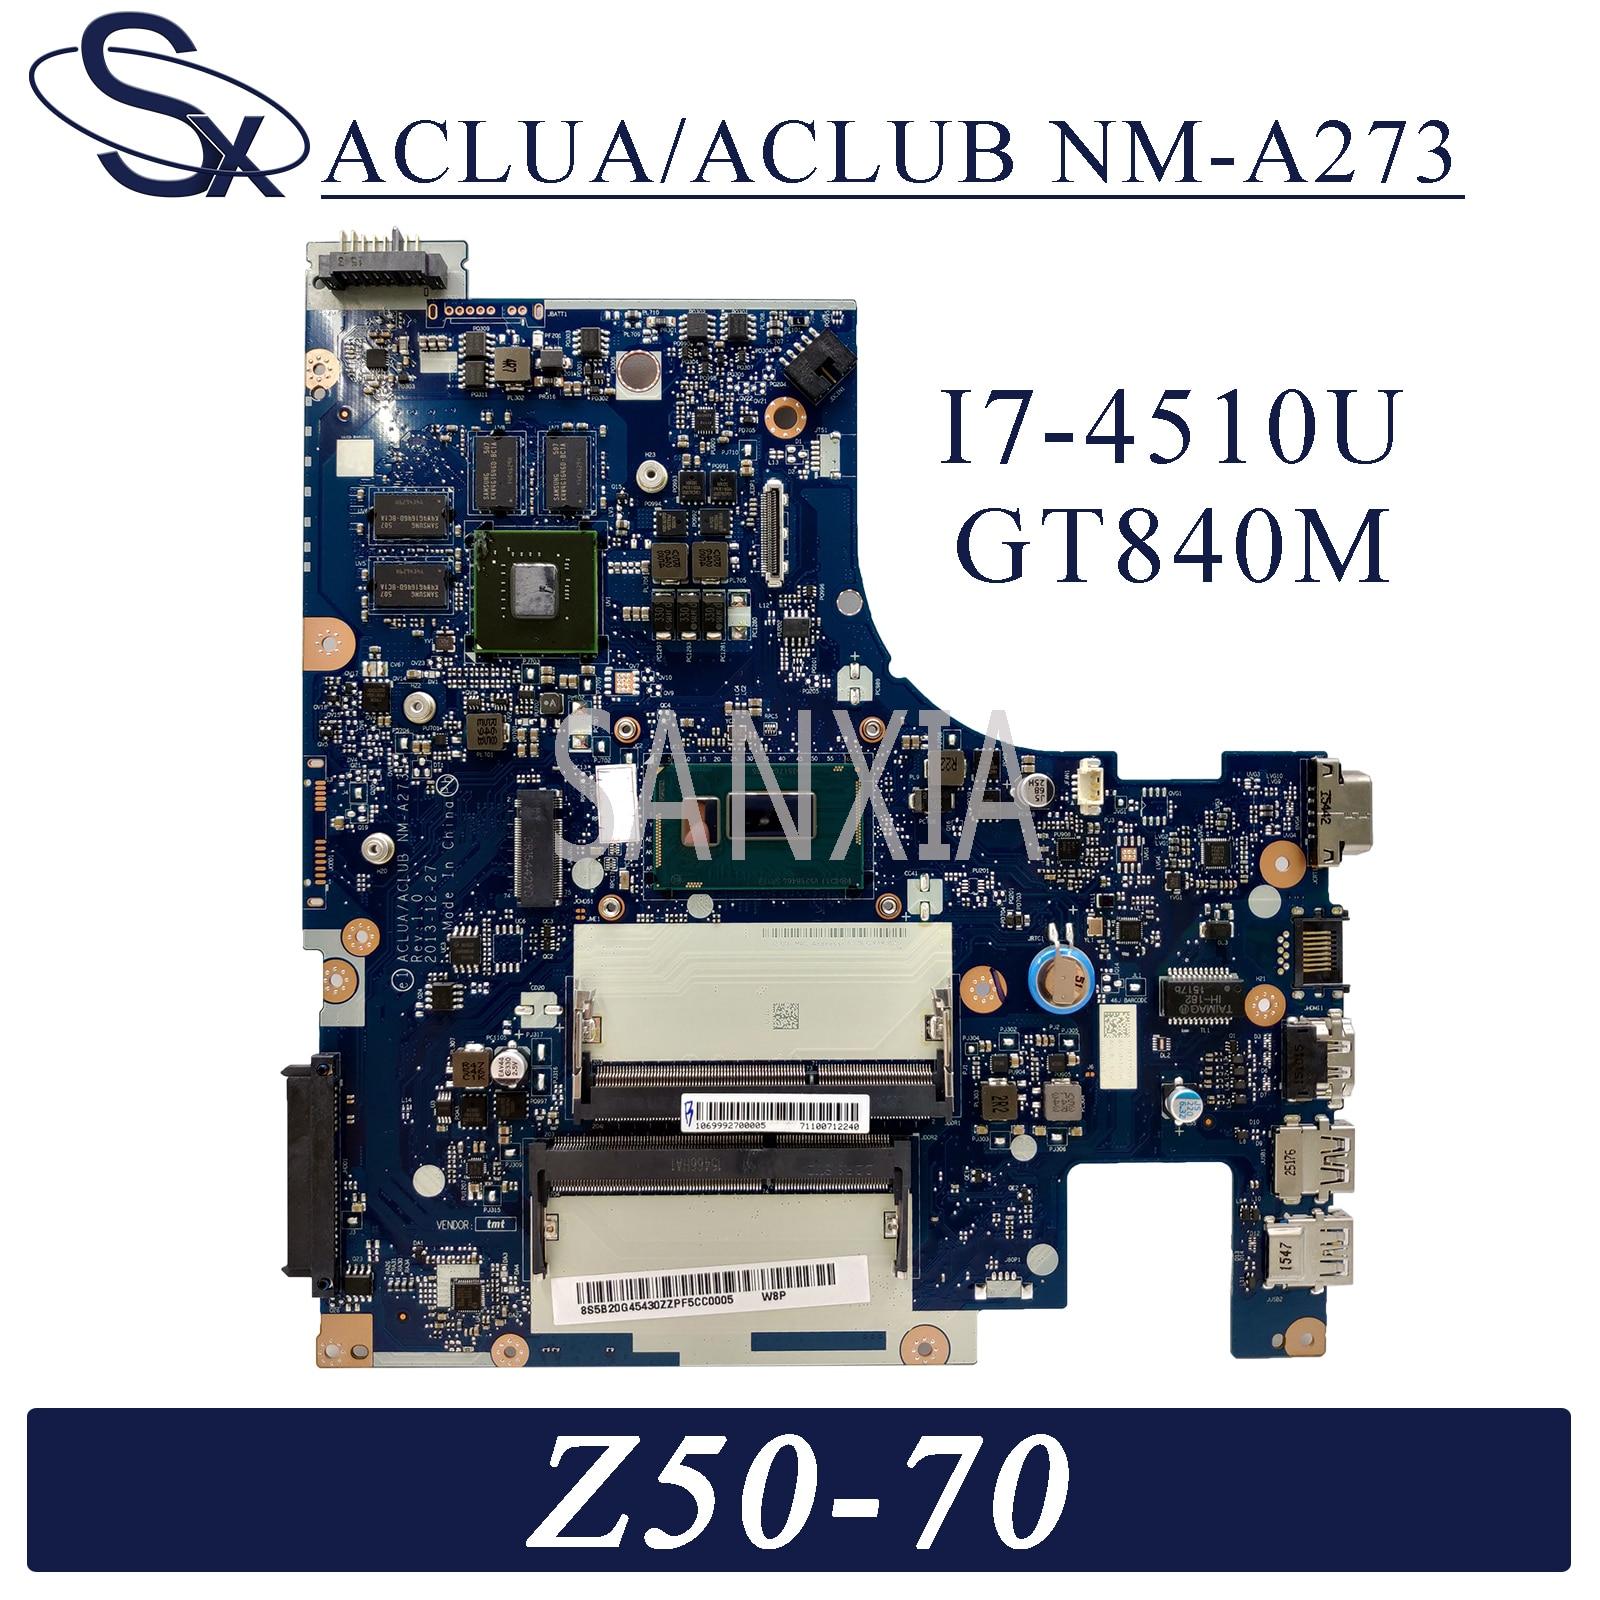 KEFU NM-A273 материнская плата для ноутбука lenovo Z50-70 G50-70M оригинальная материнская плата I7-4510U GT840M